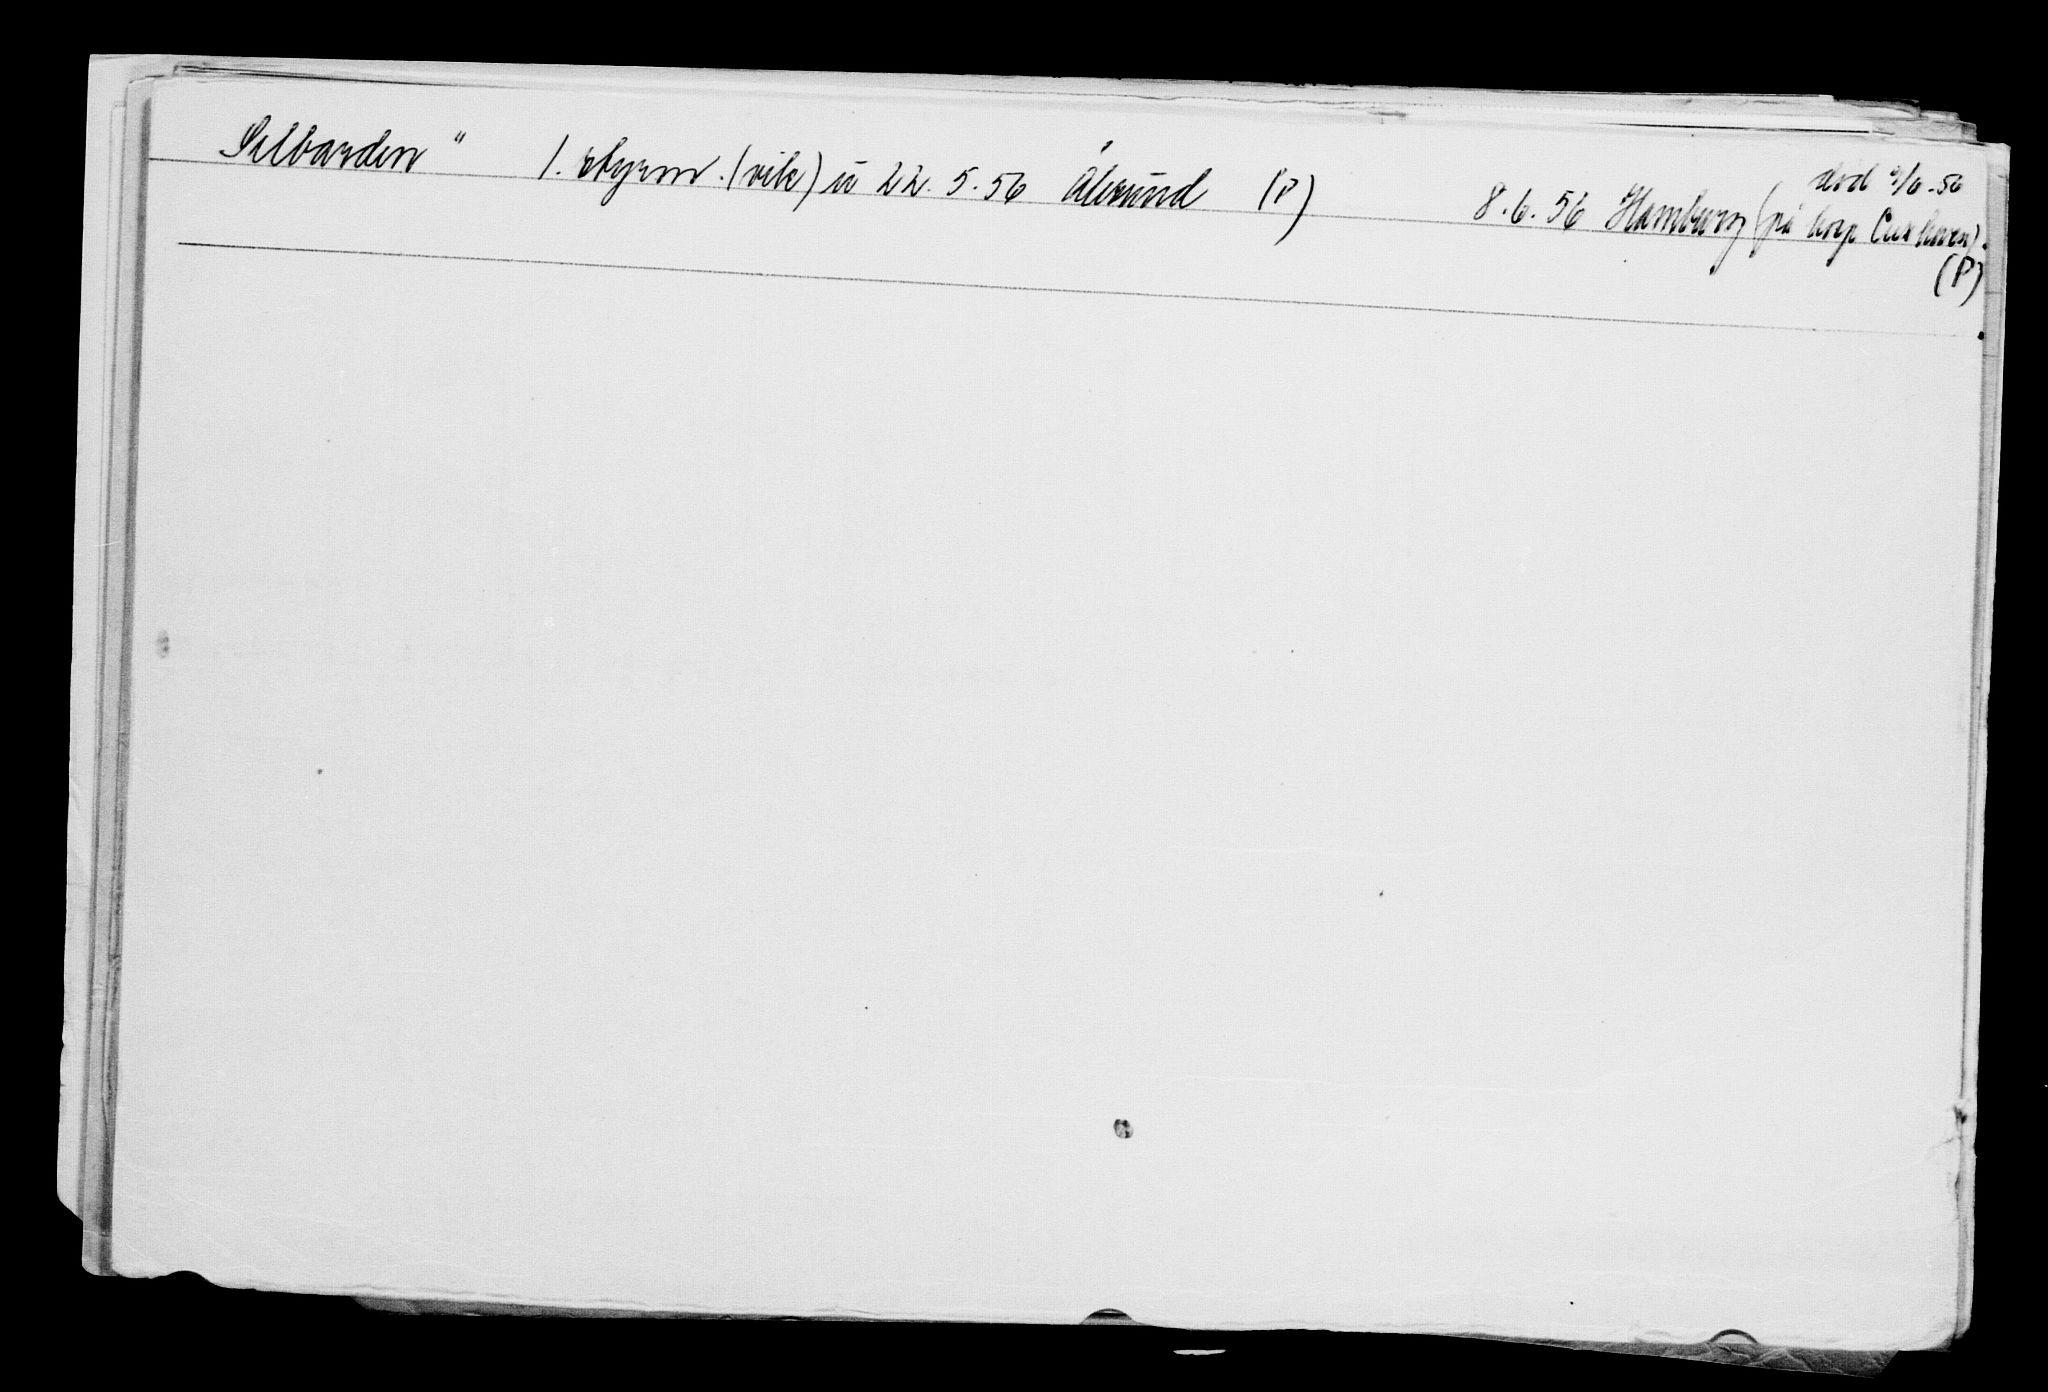 RA, Direktoratet for sjømenn, G/Gb/L0002: Hovedkort, 1883-1885, p. 26